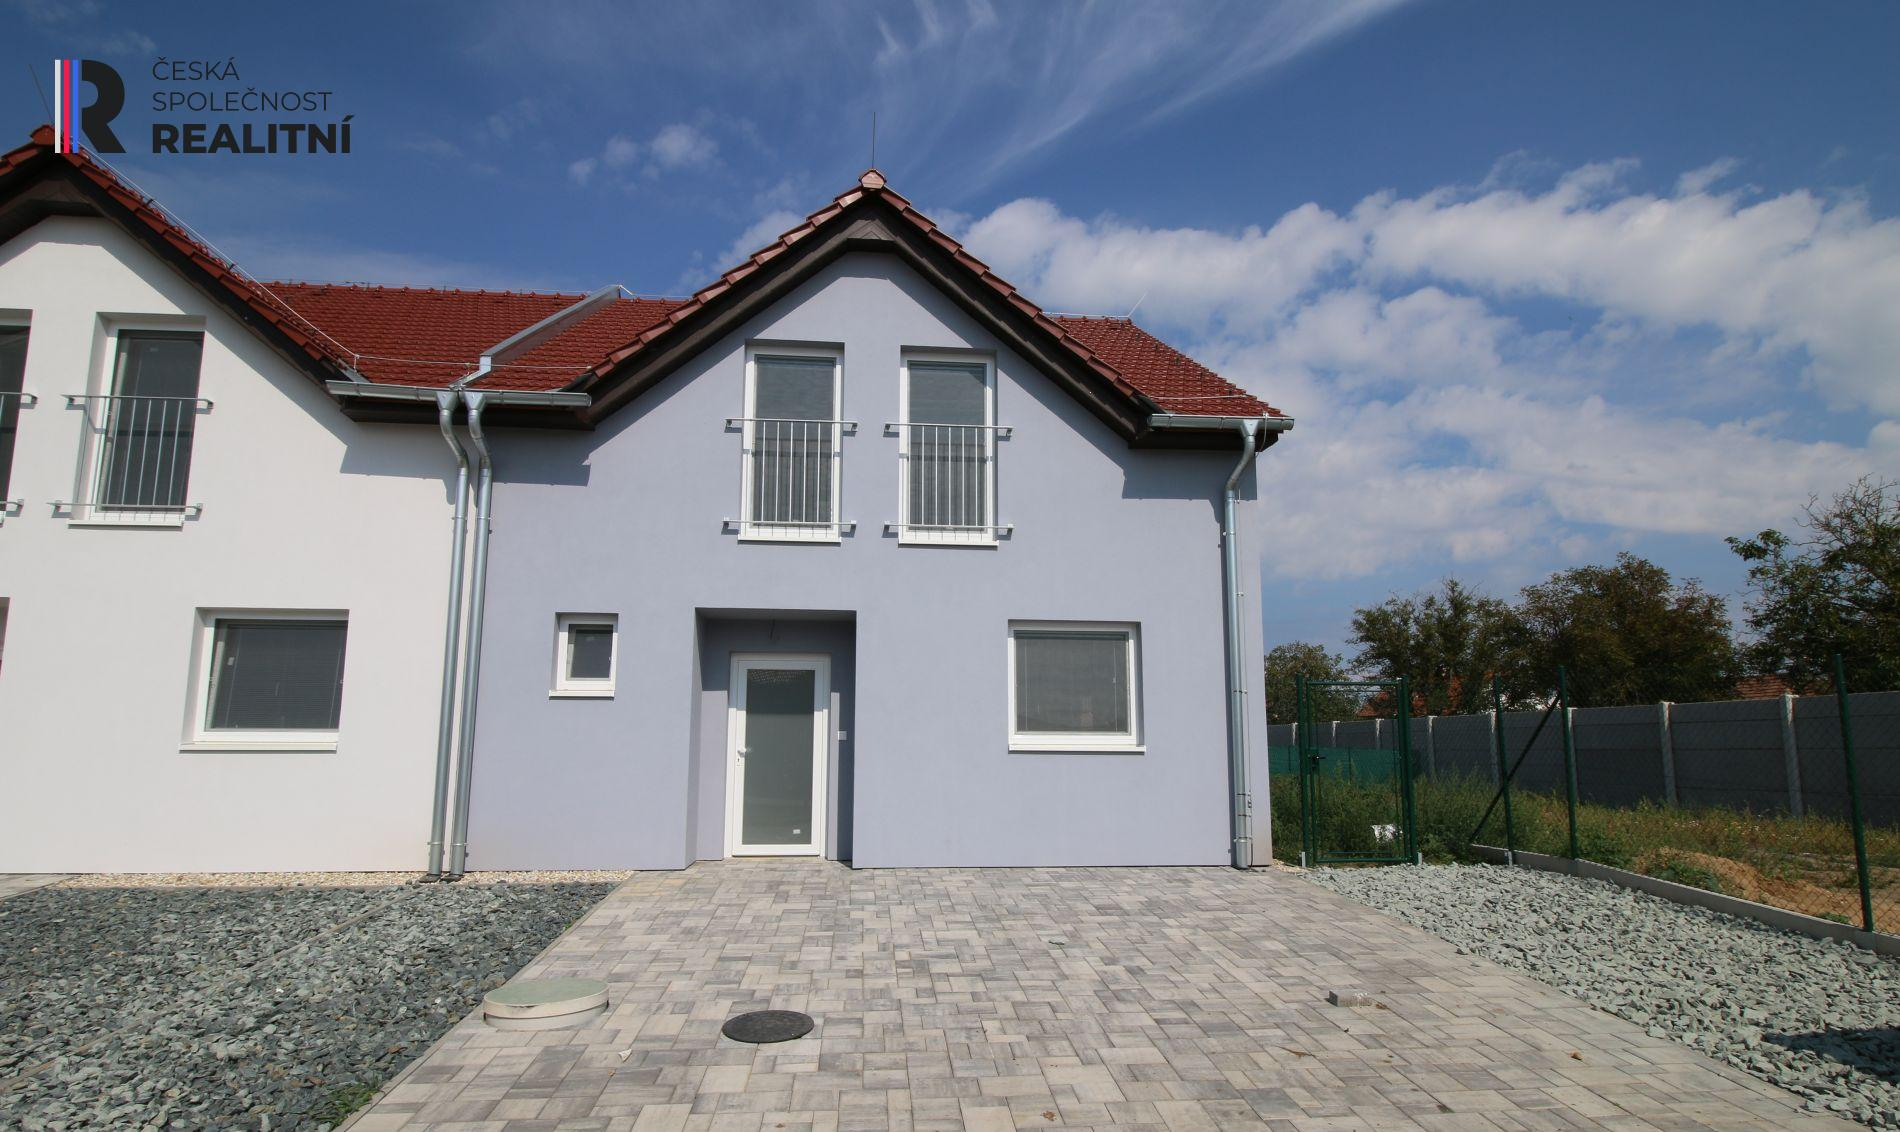 Rodinný dům 4kk, Holasice , pozemek 348m2, novostavba